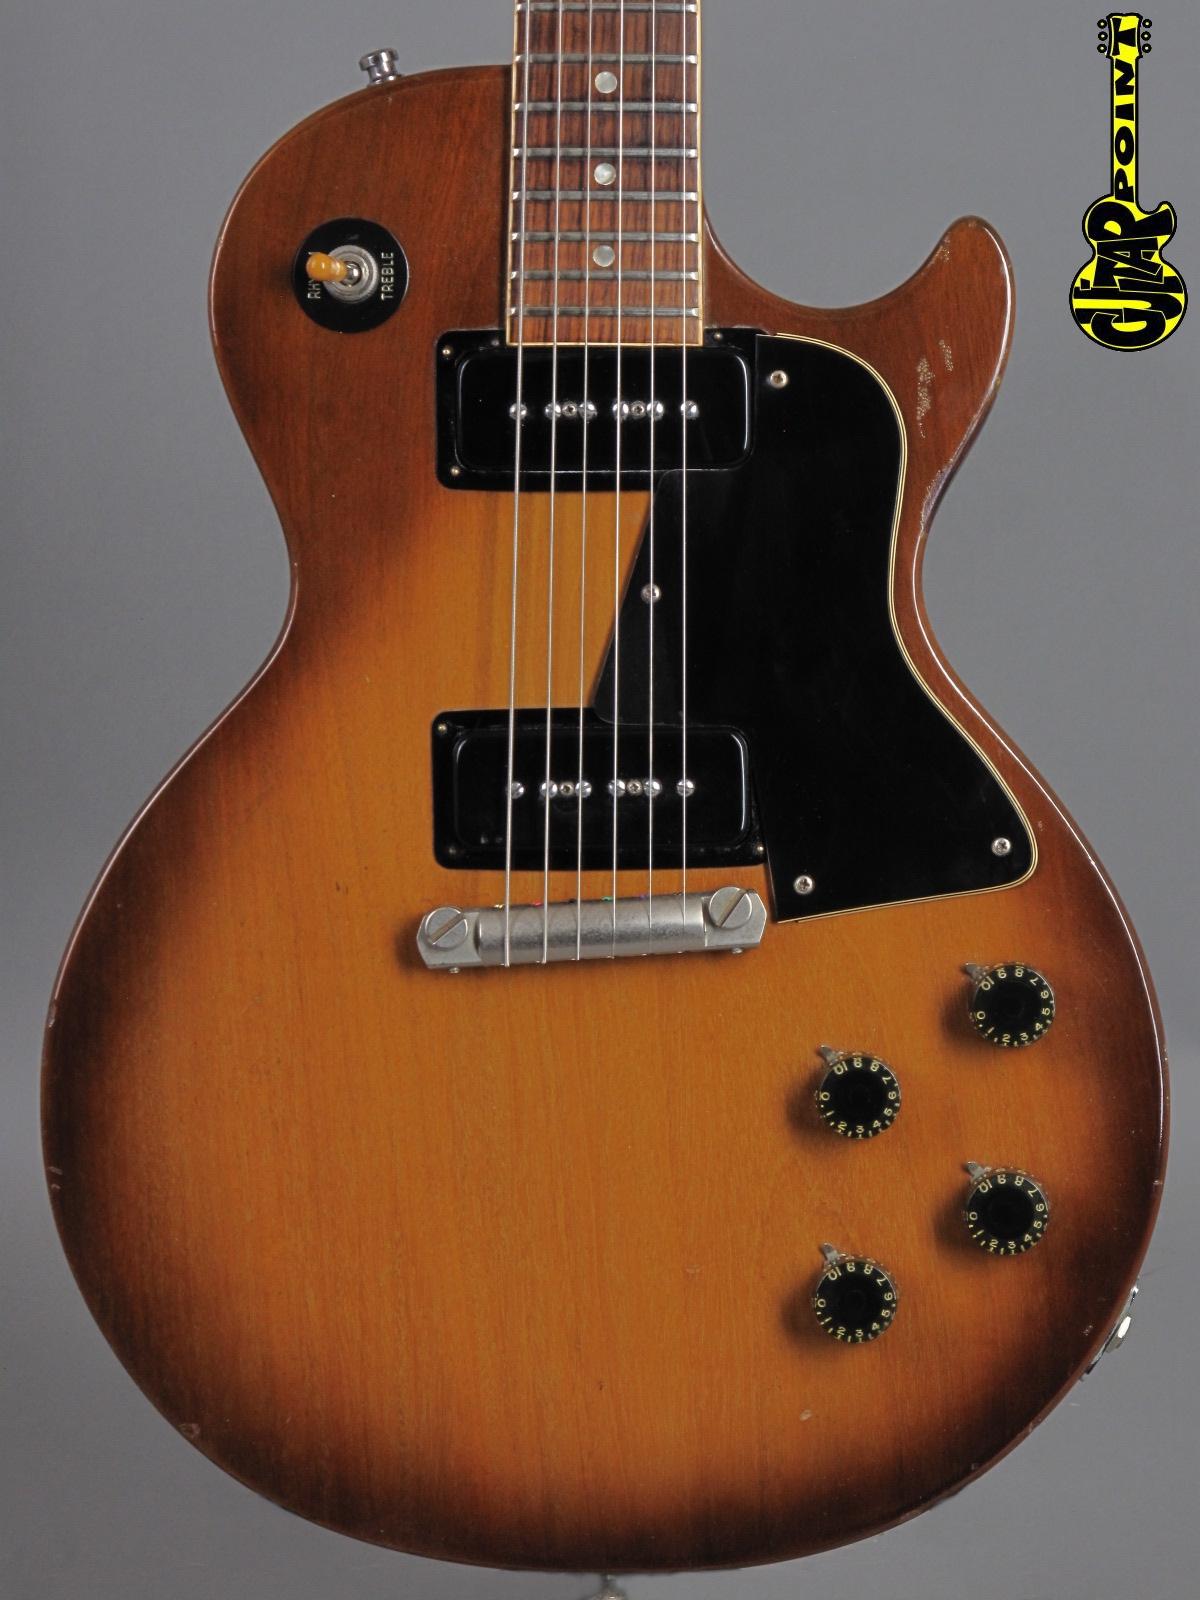 1974 Gibson Les Paul Special 55 - Sunburst